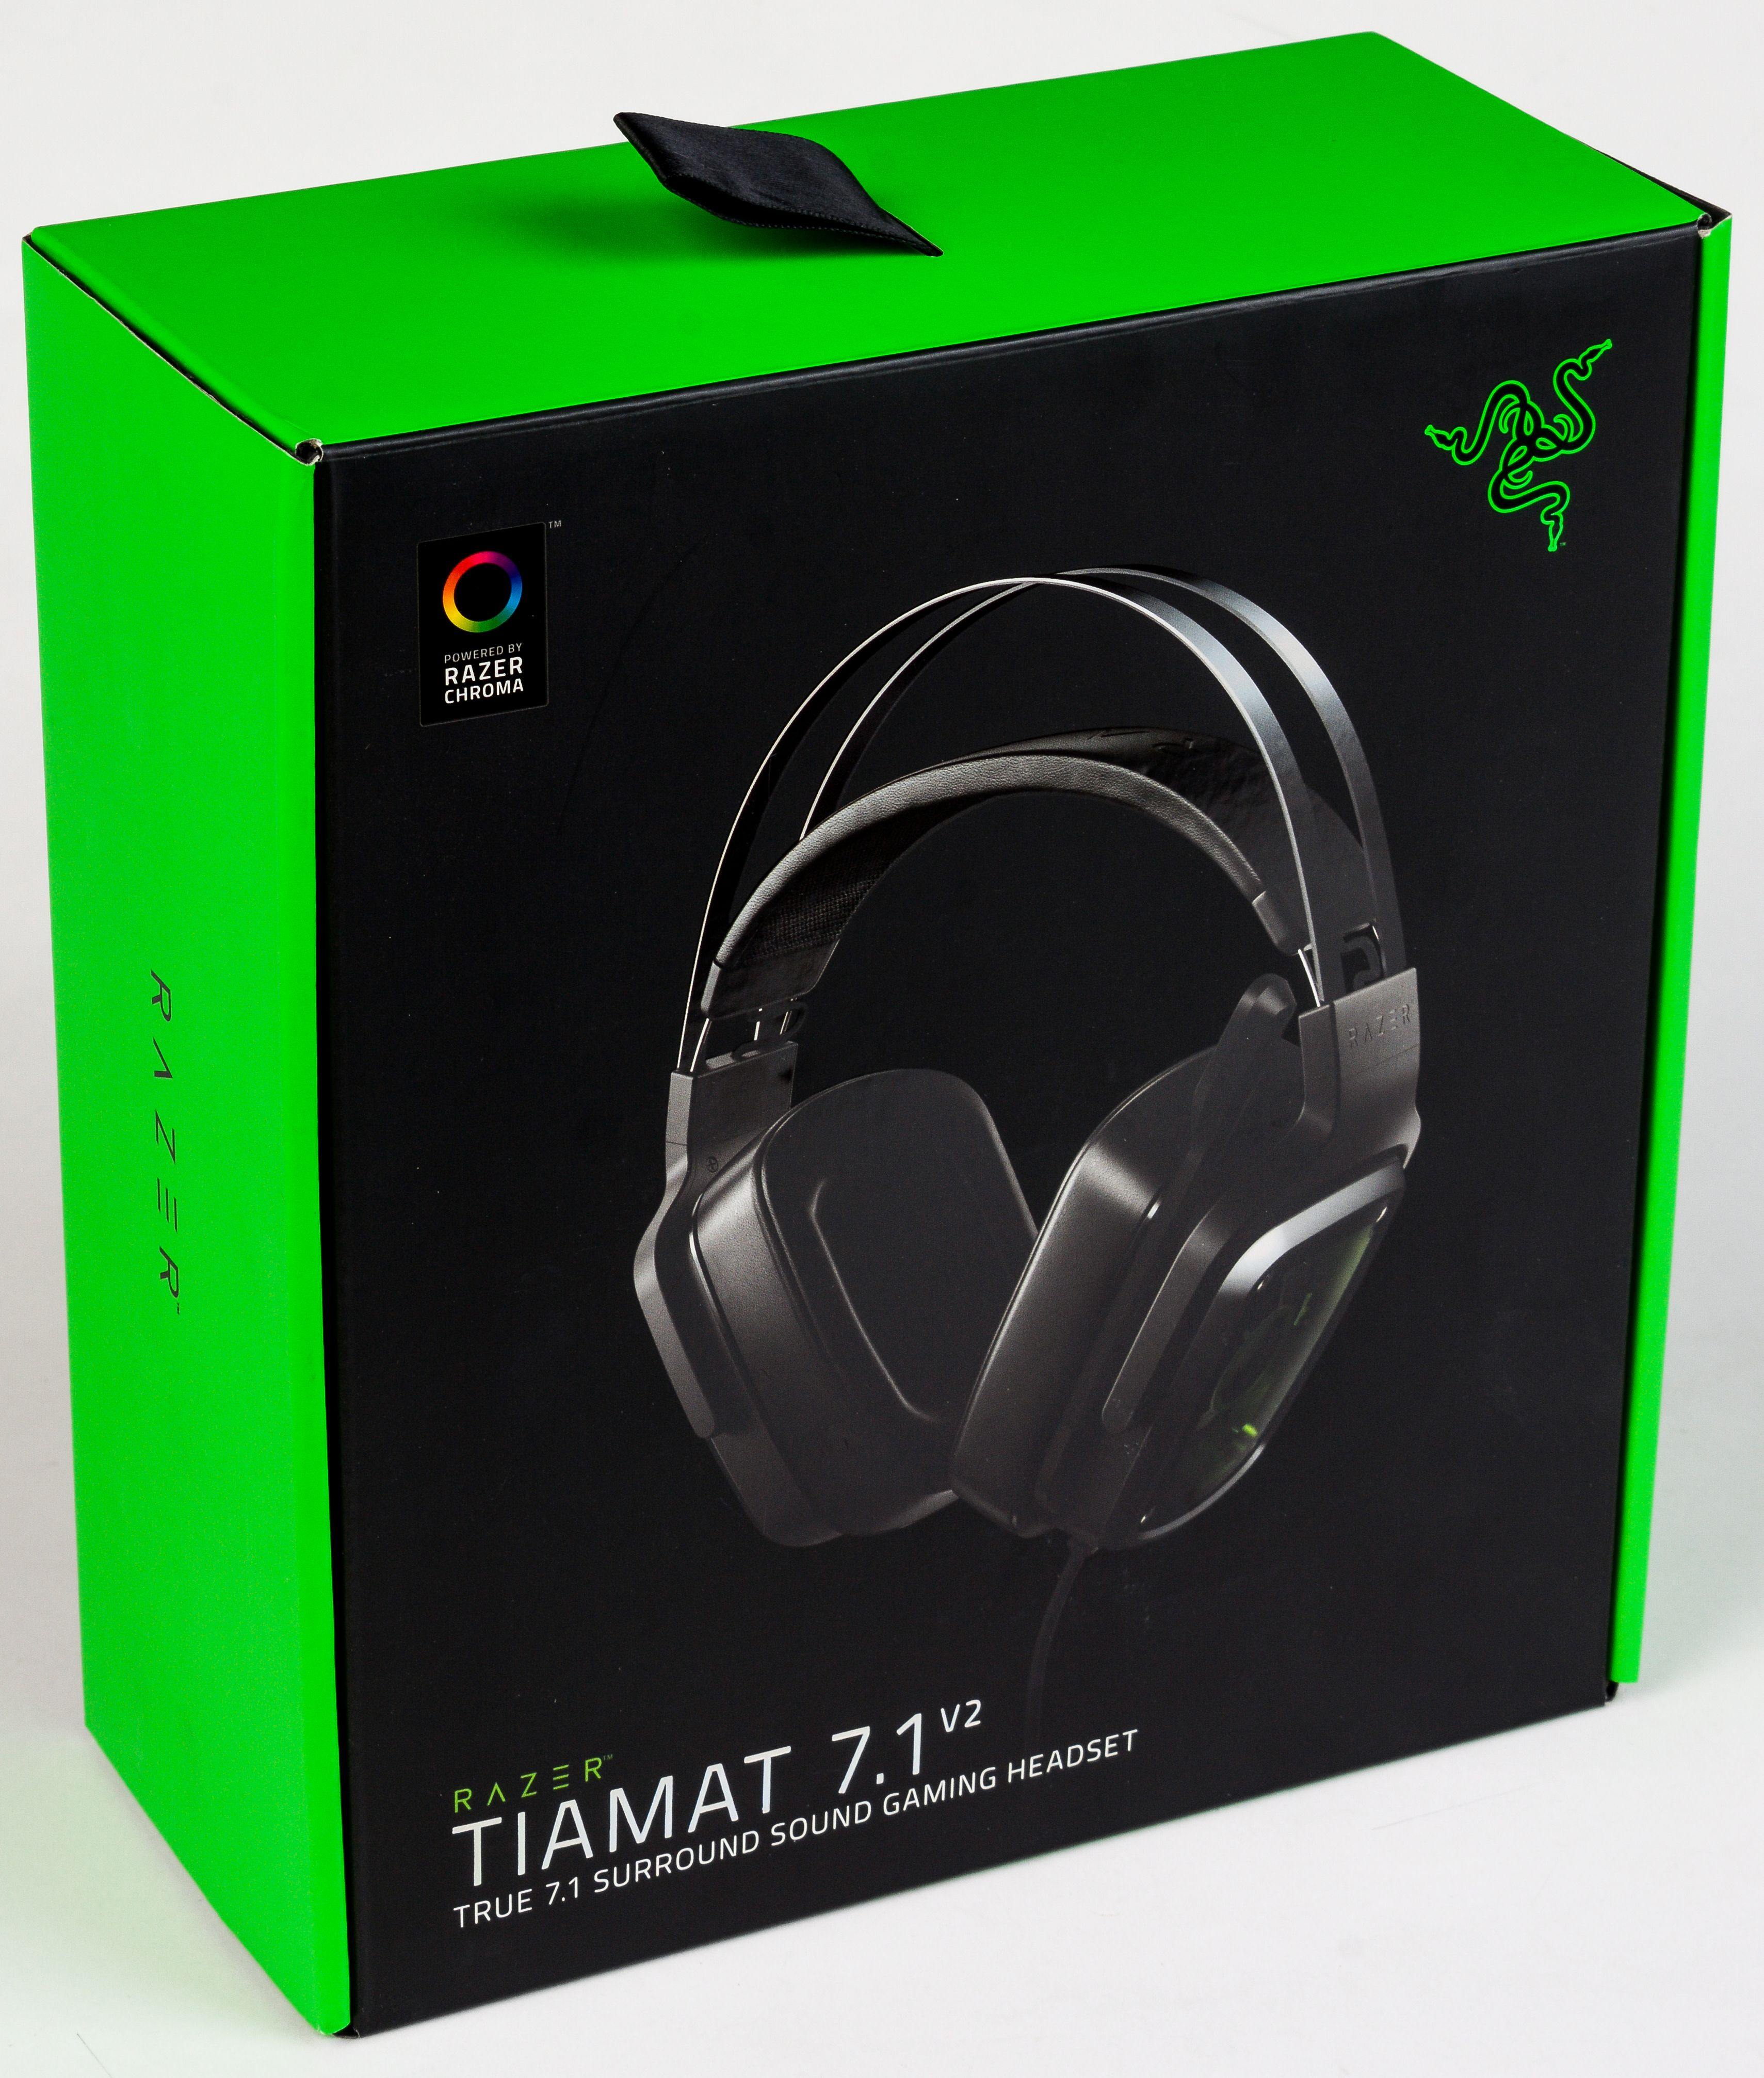 Гейминг слушалки Razer Tiamat 7.1 V2 (разопакован) - 2